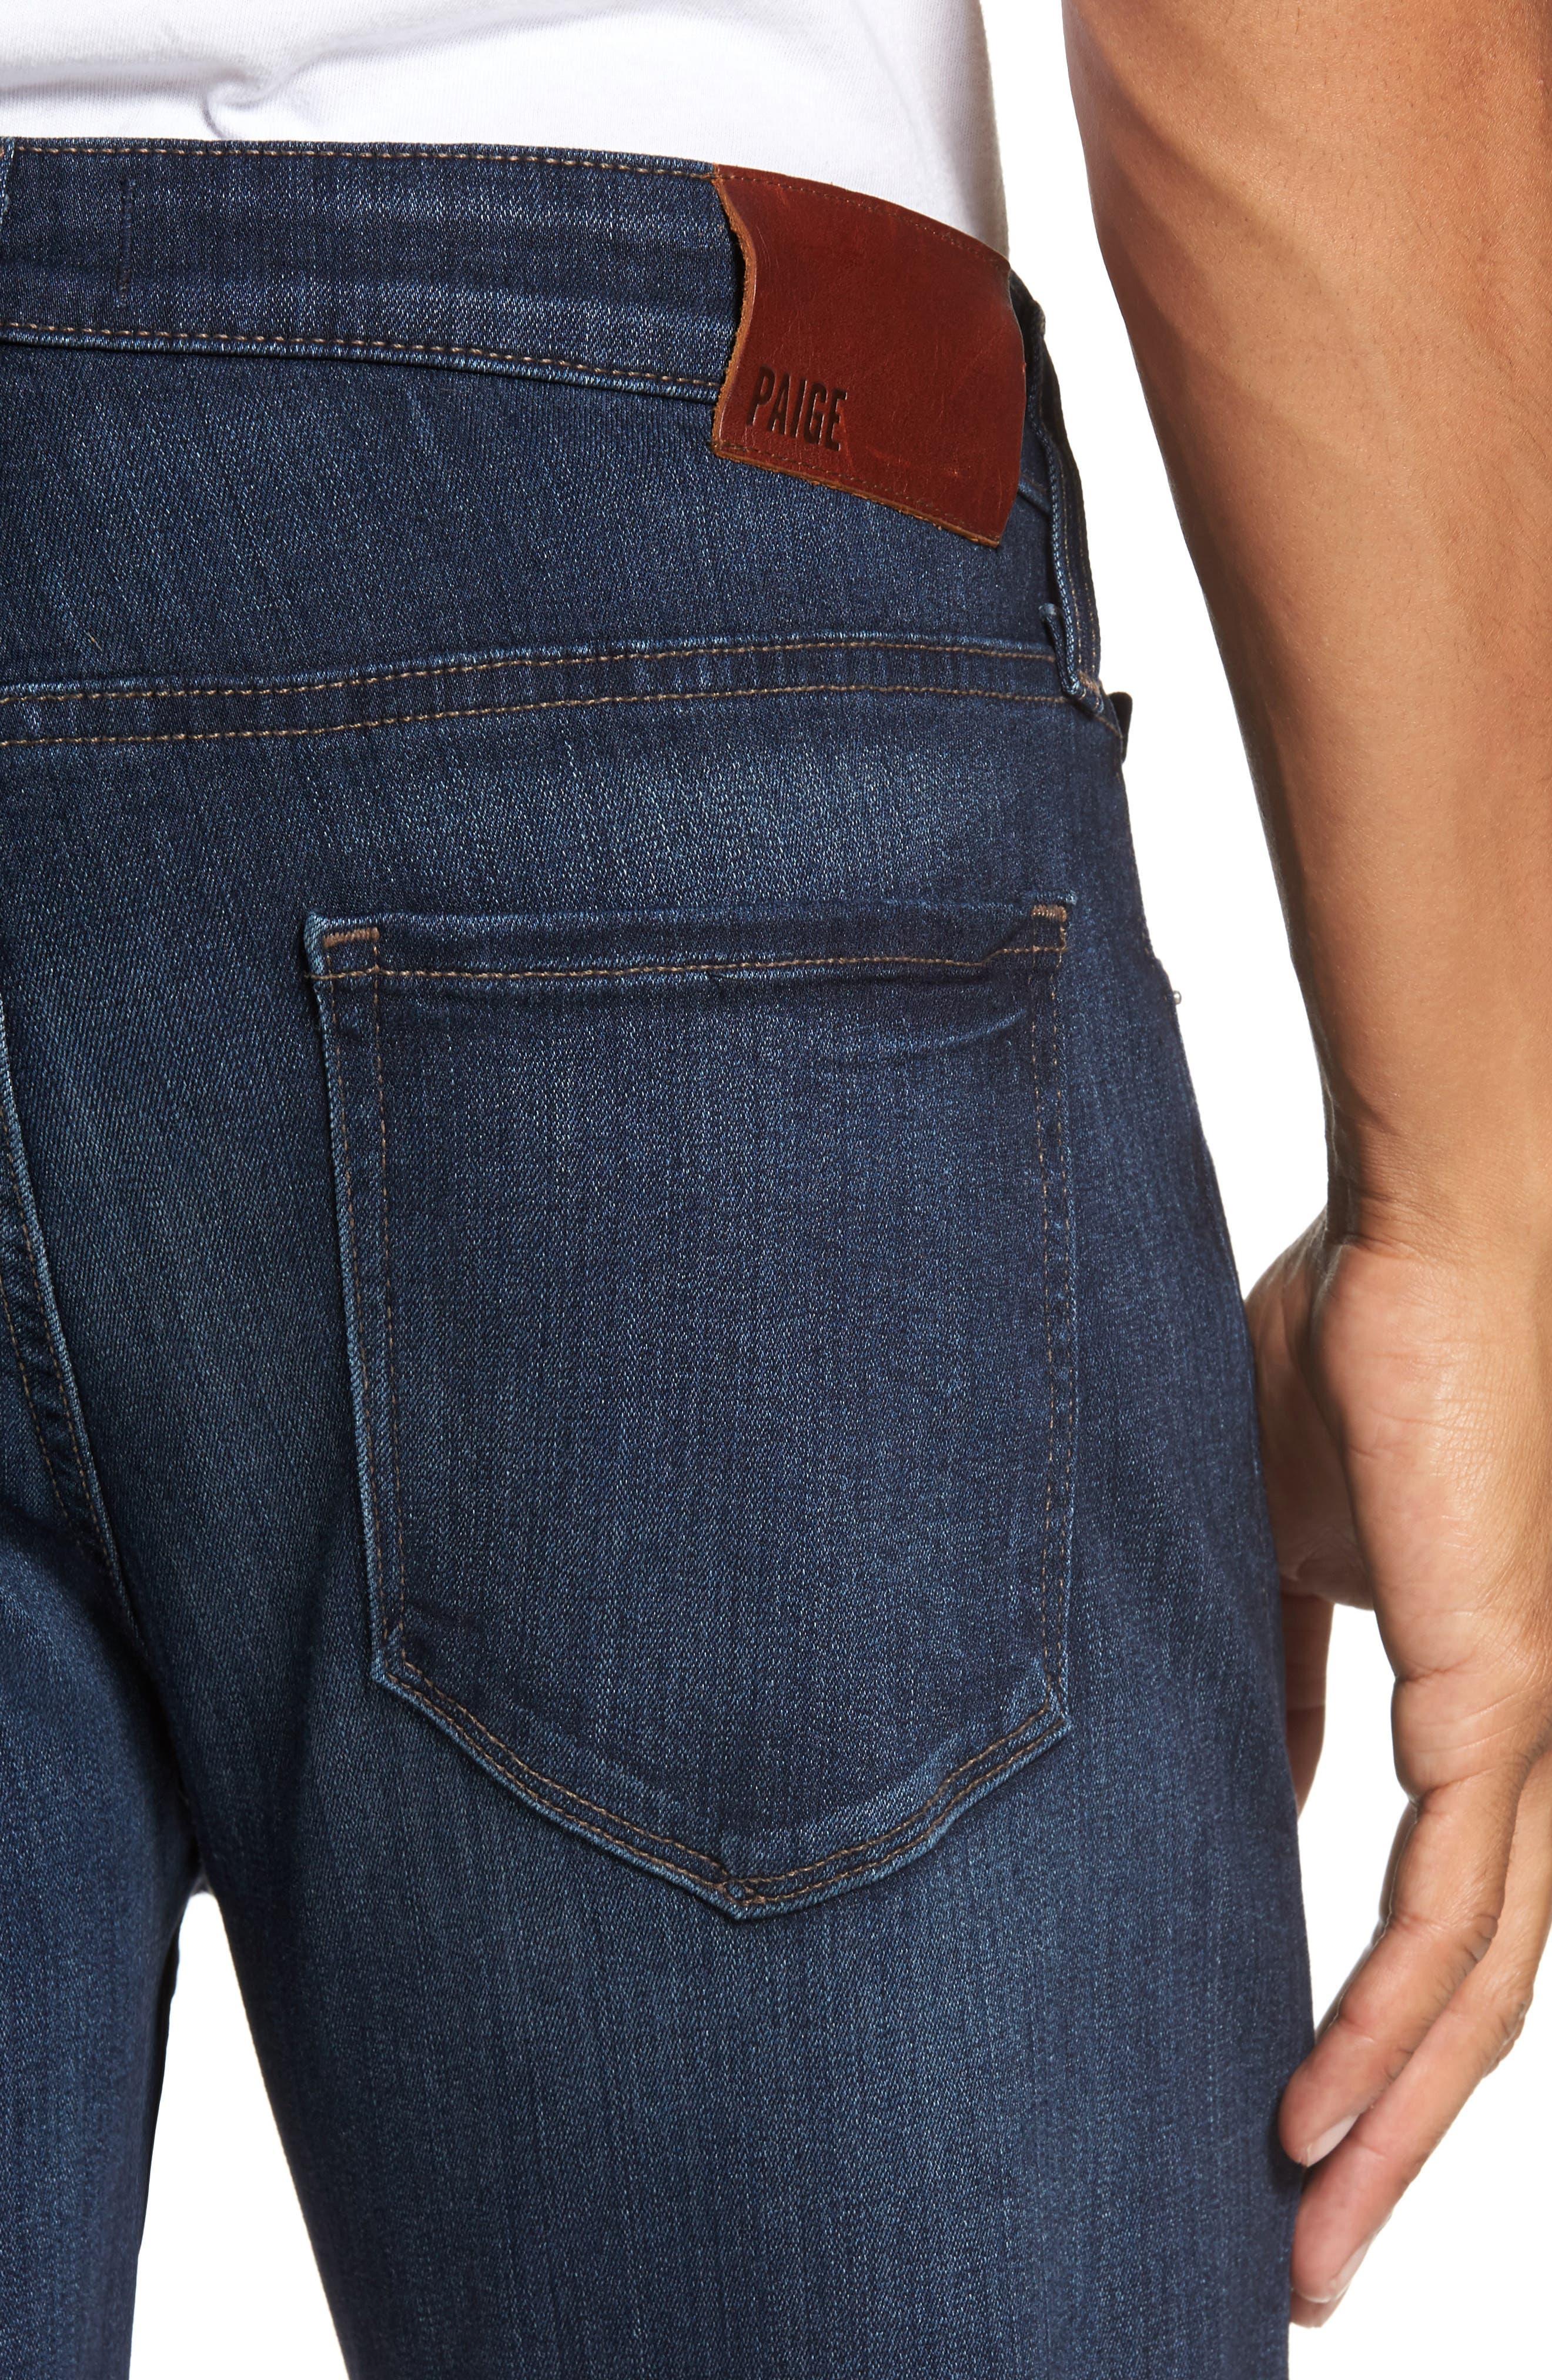 Transcend - Federal Slim Straight Leg Jeans,                             Alternate thumbnail 4, color,                             Barron